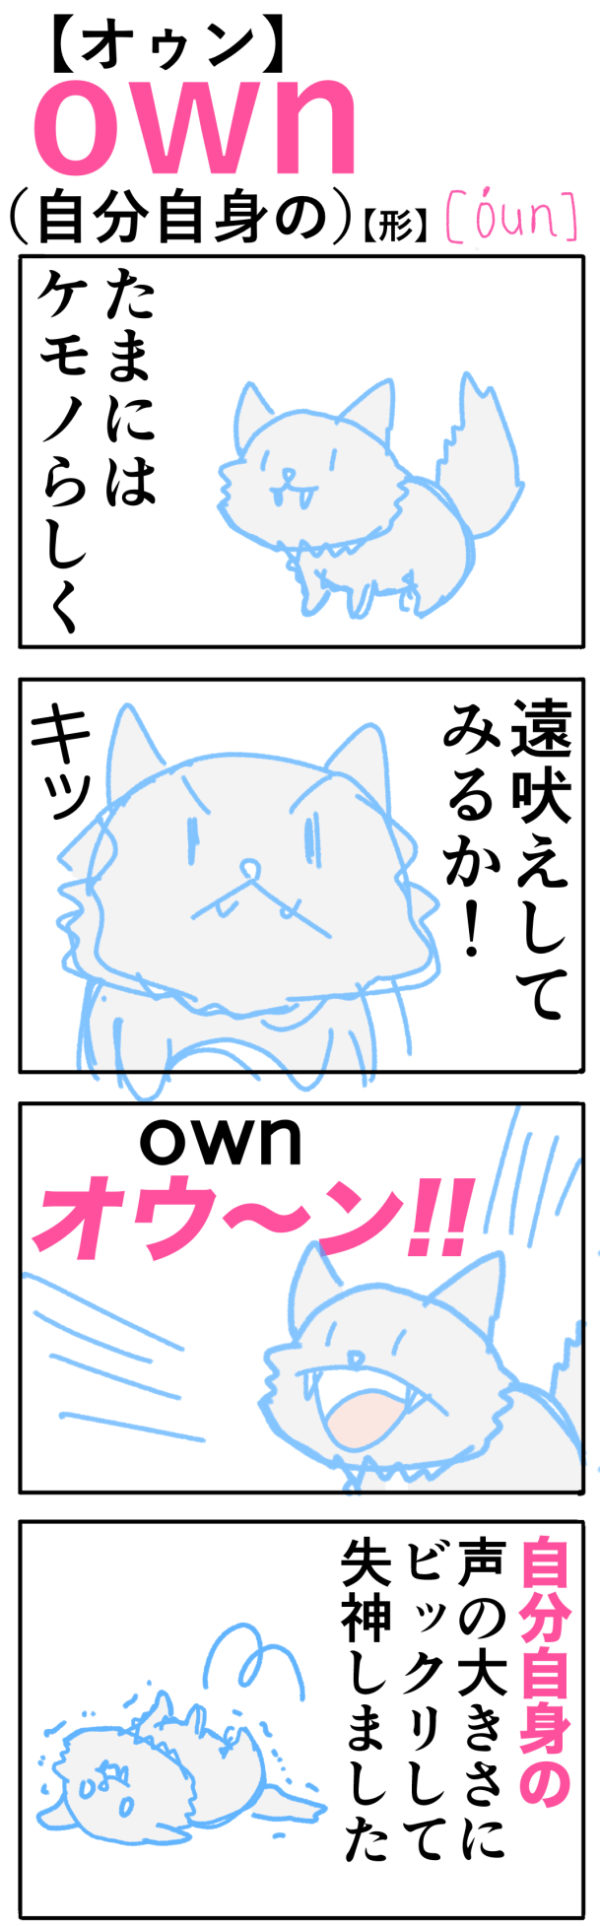 own(自分自身の)の語呂合わせ英単語